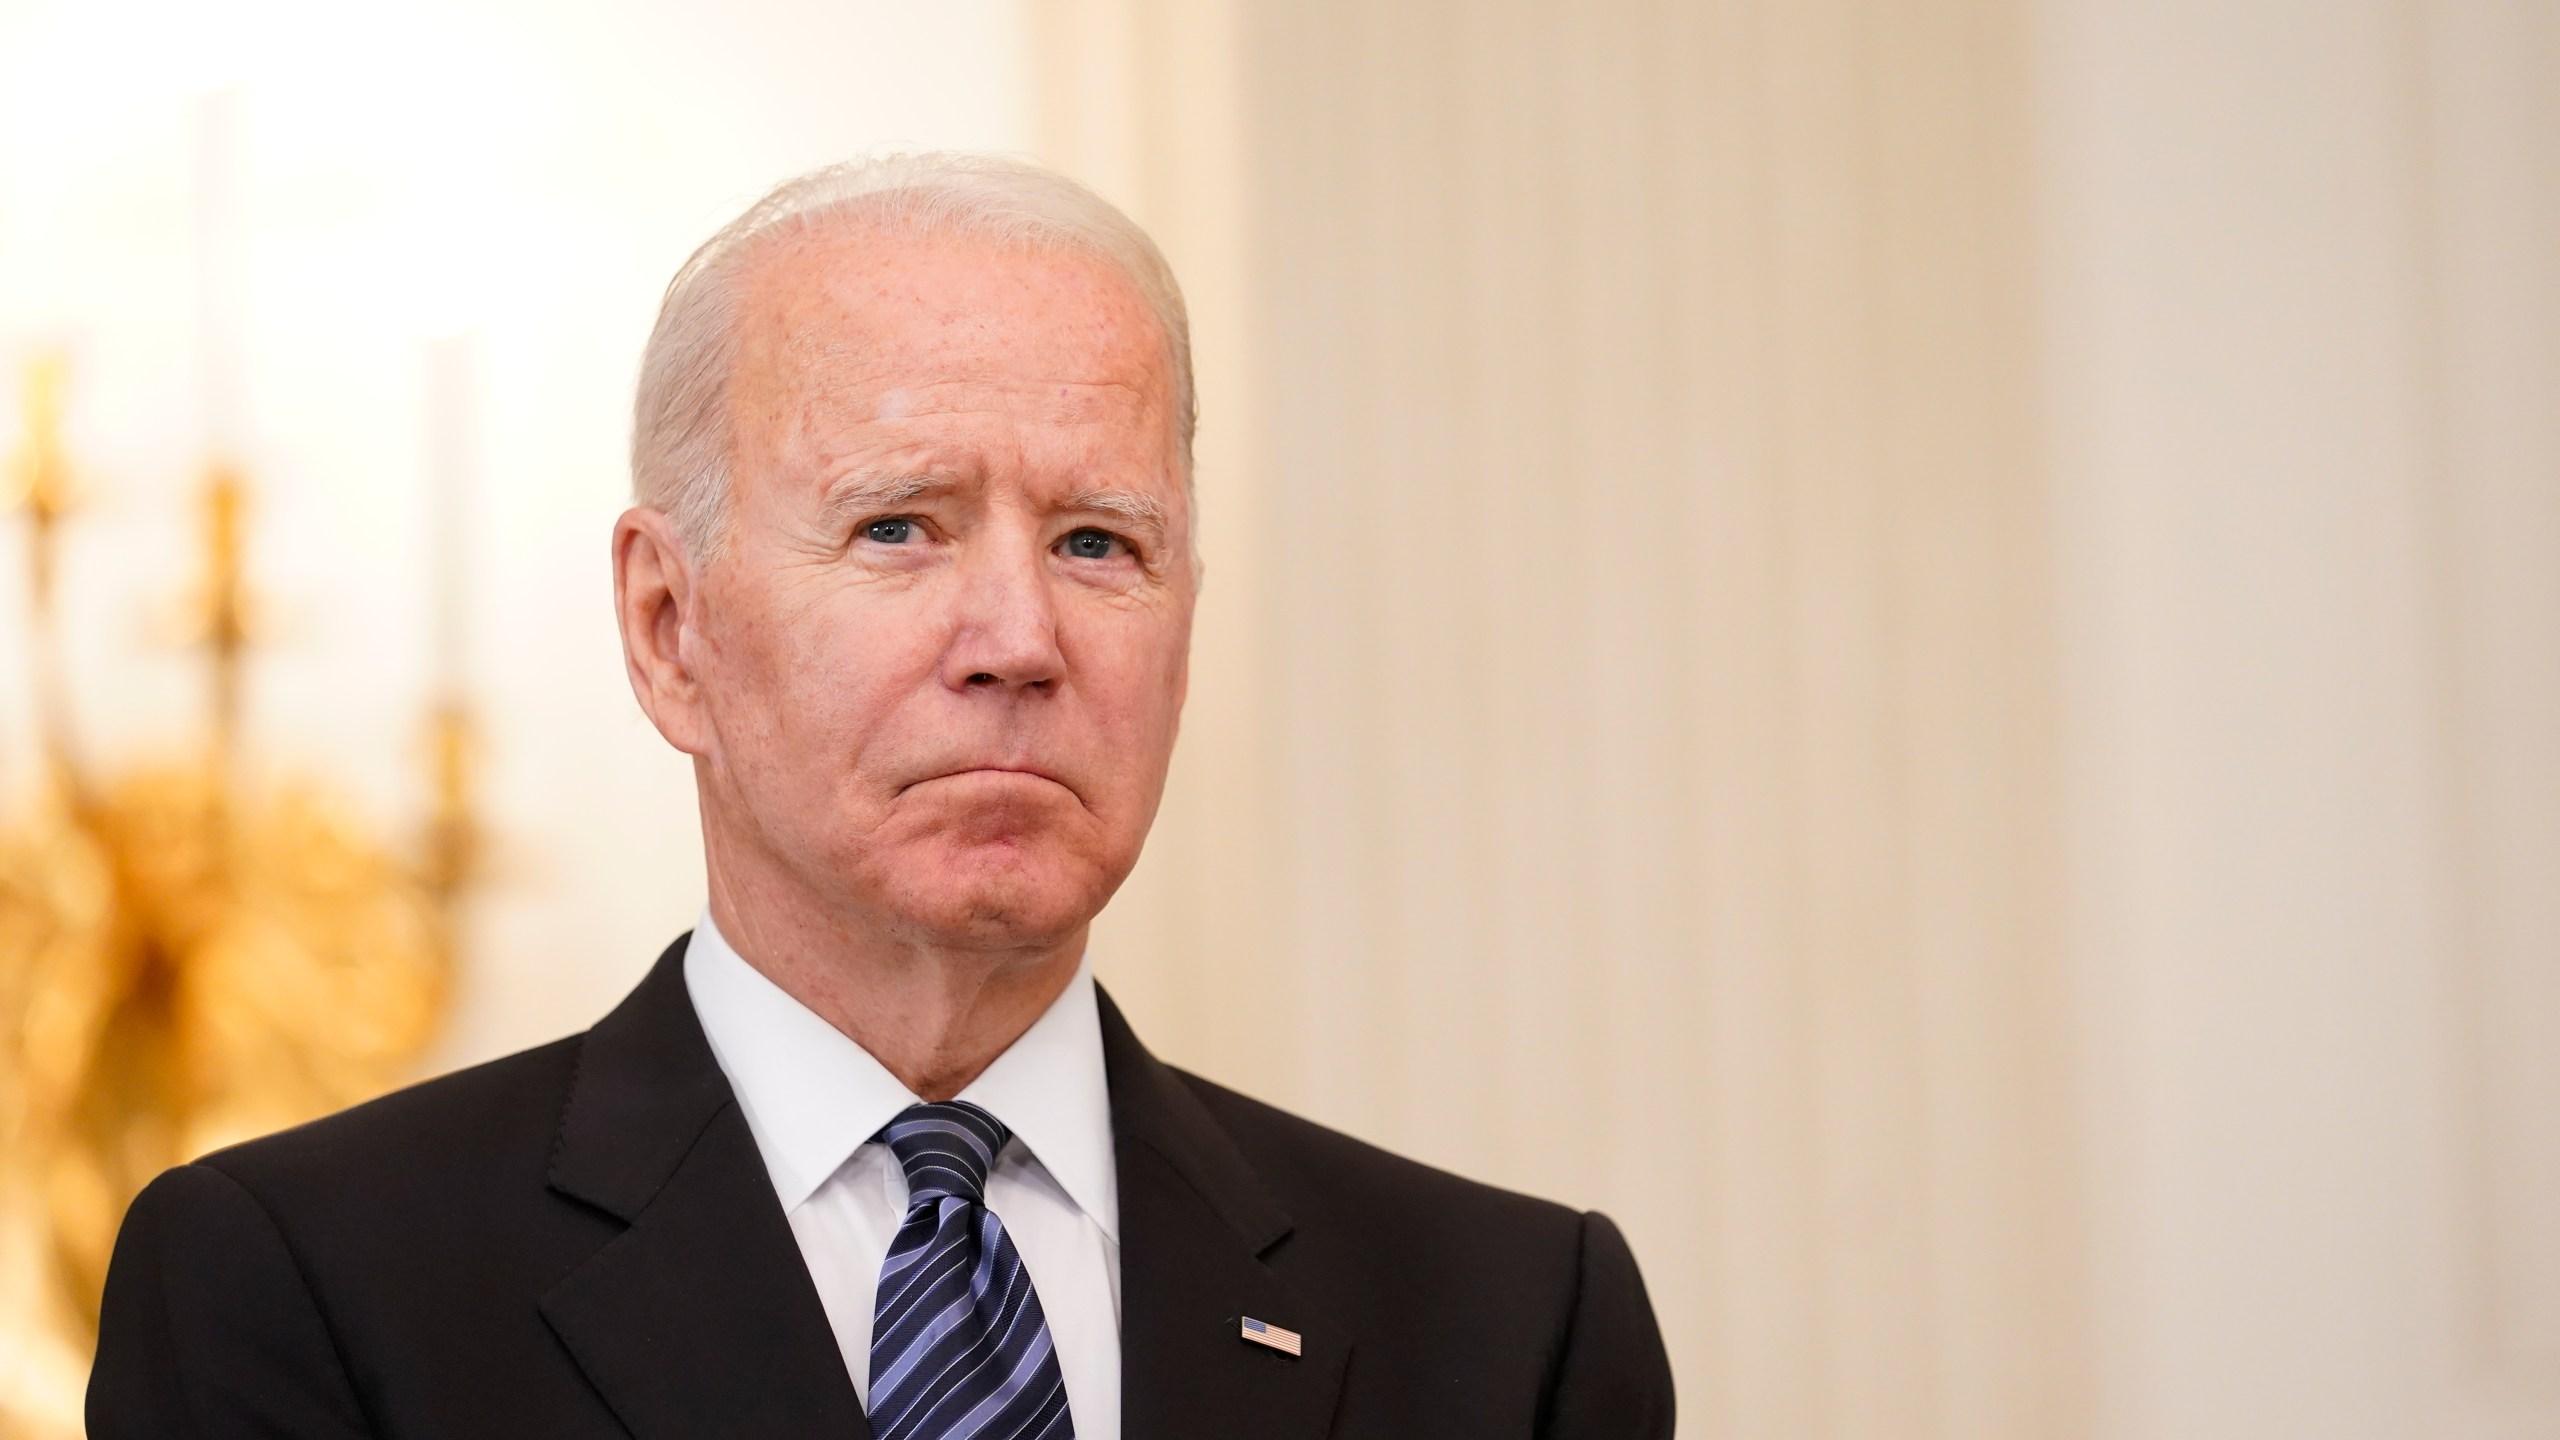 Joe Biden, Merrick Garland